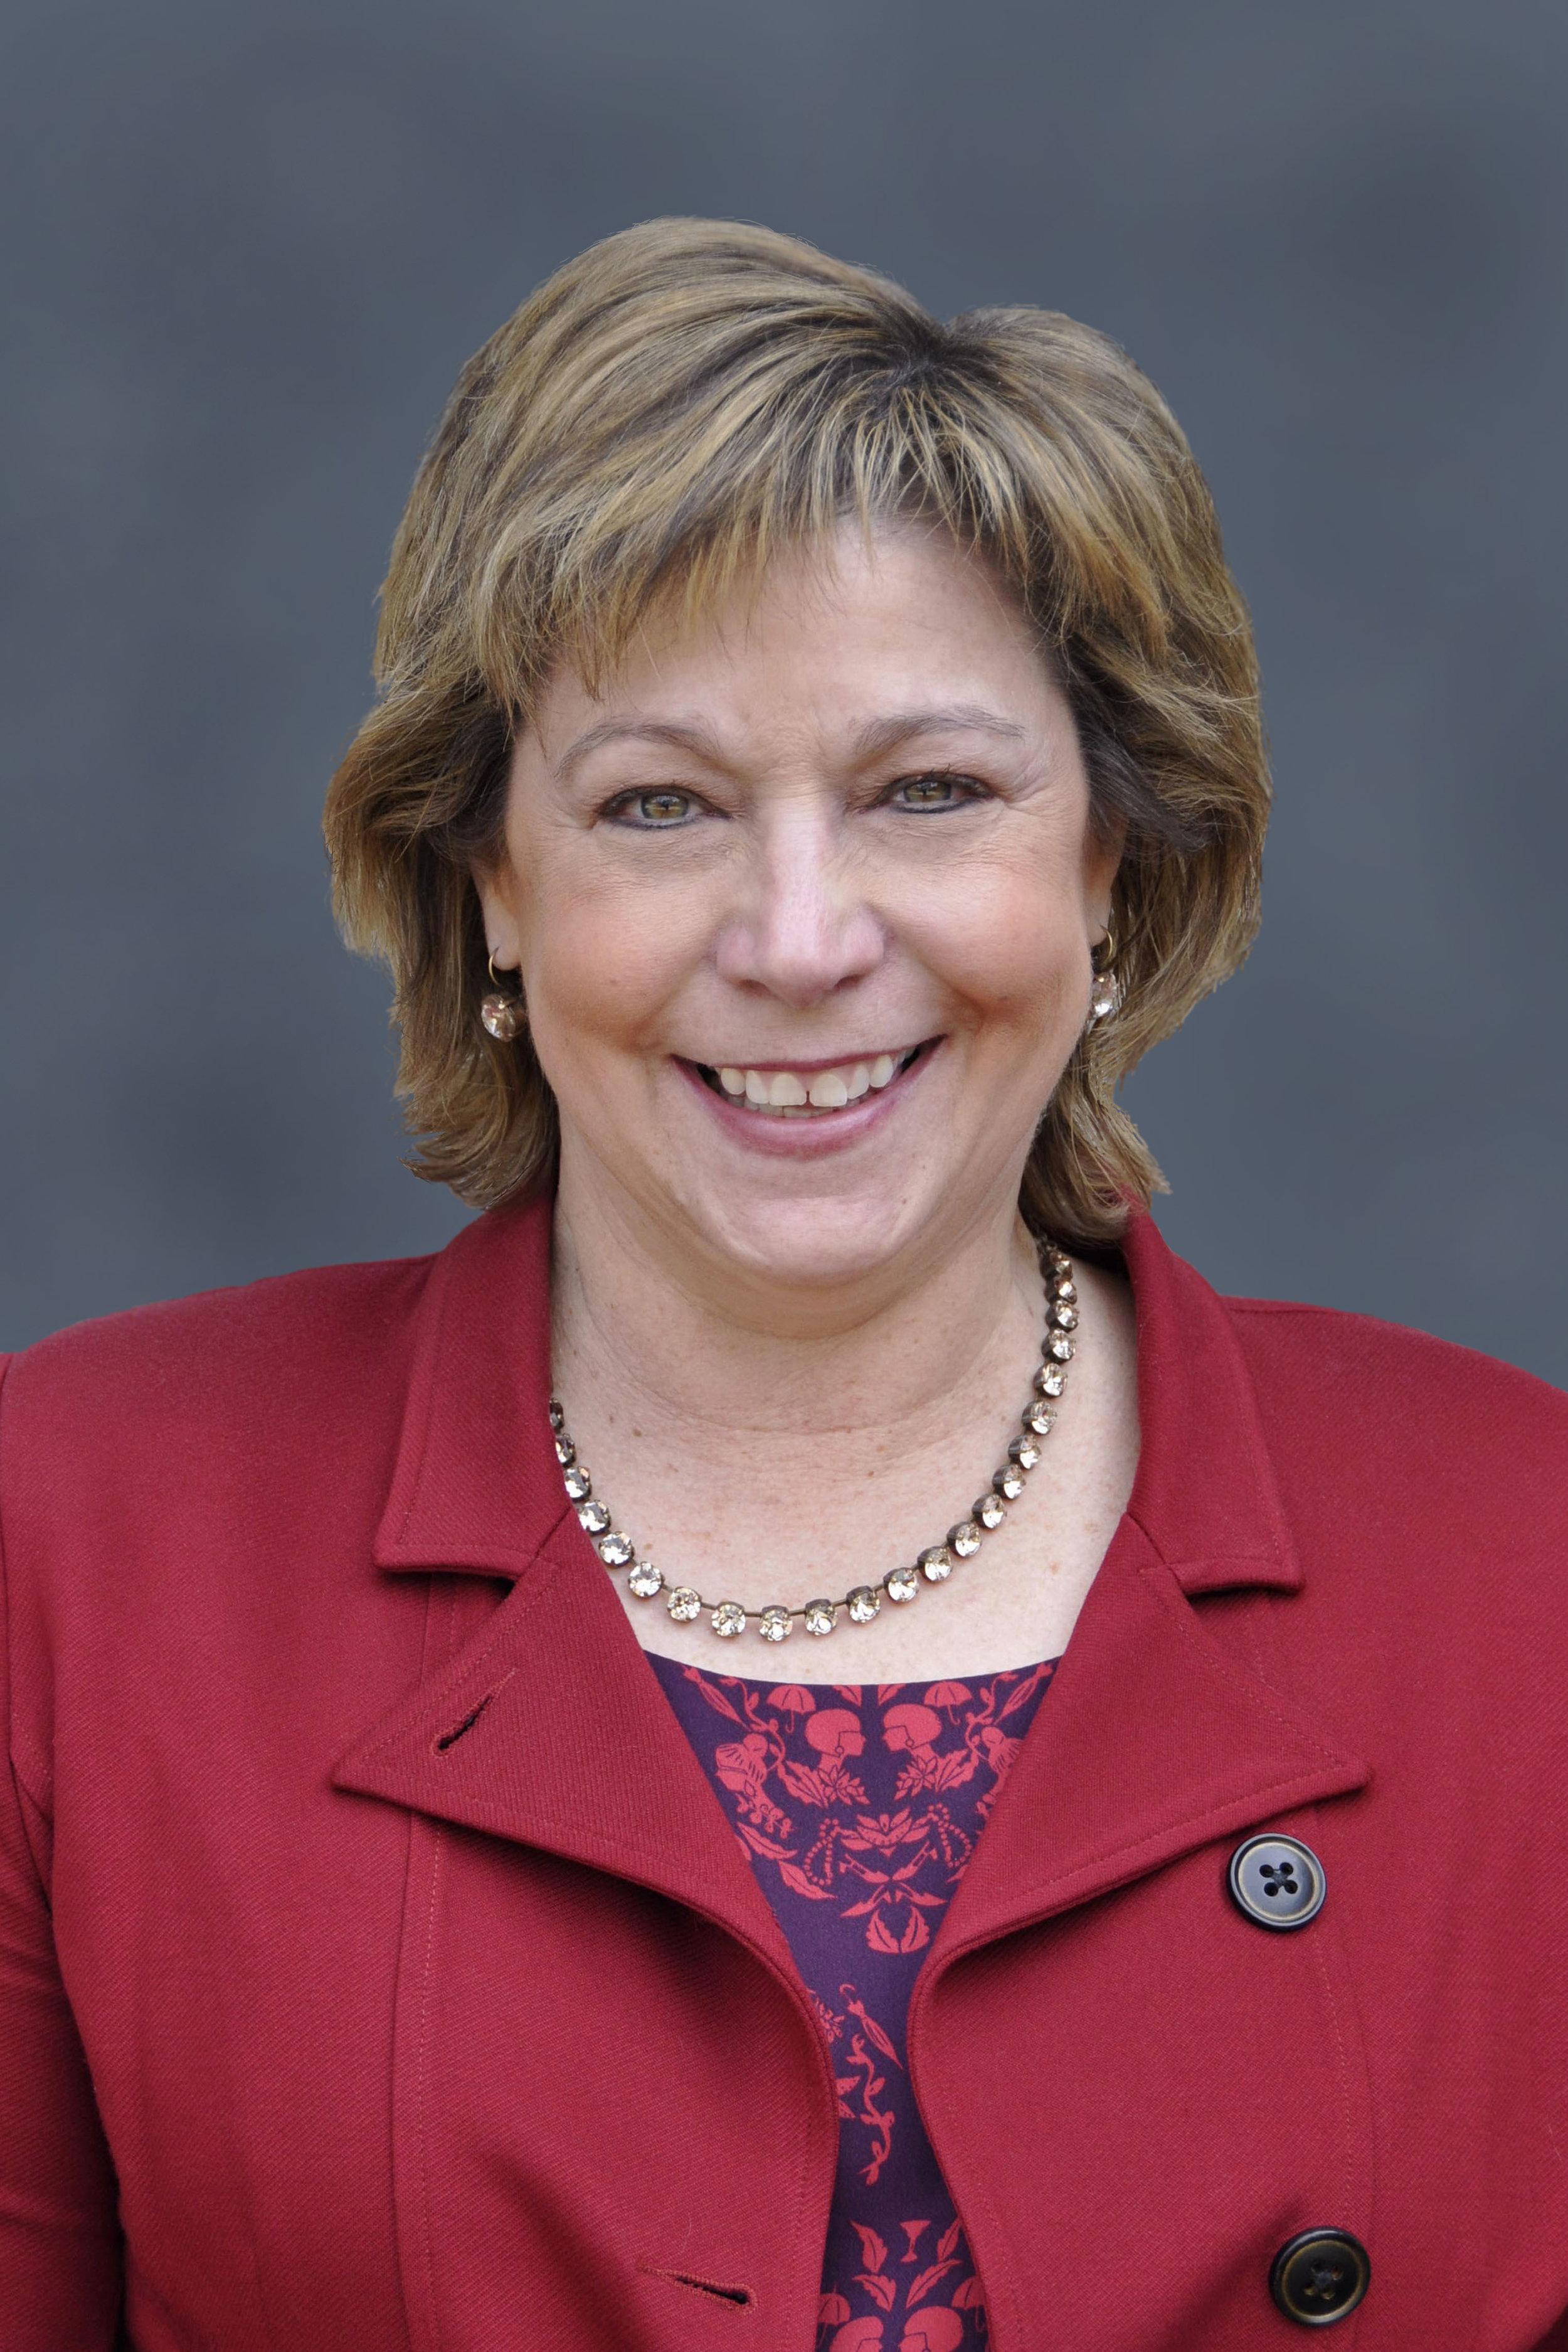 Sally Williams Director (517) 373-2540  williamss1@michigan.gov   Website